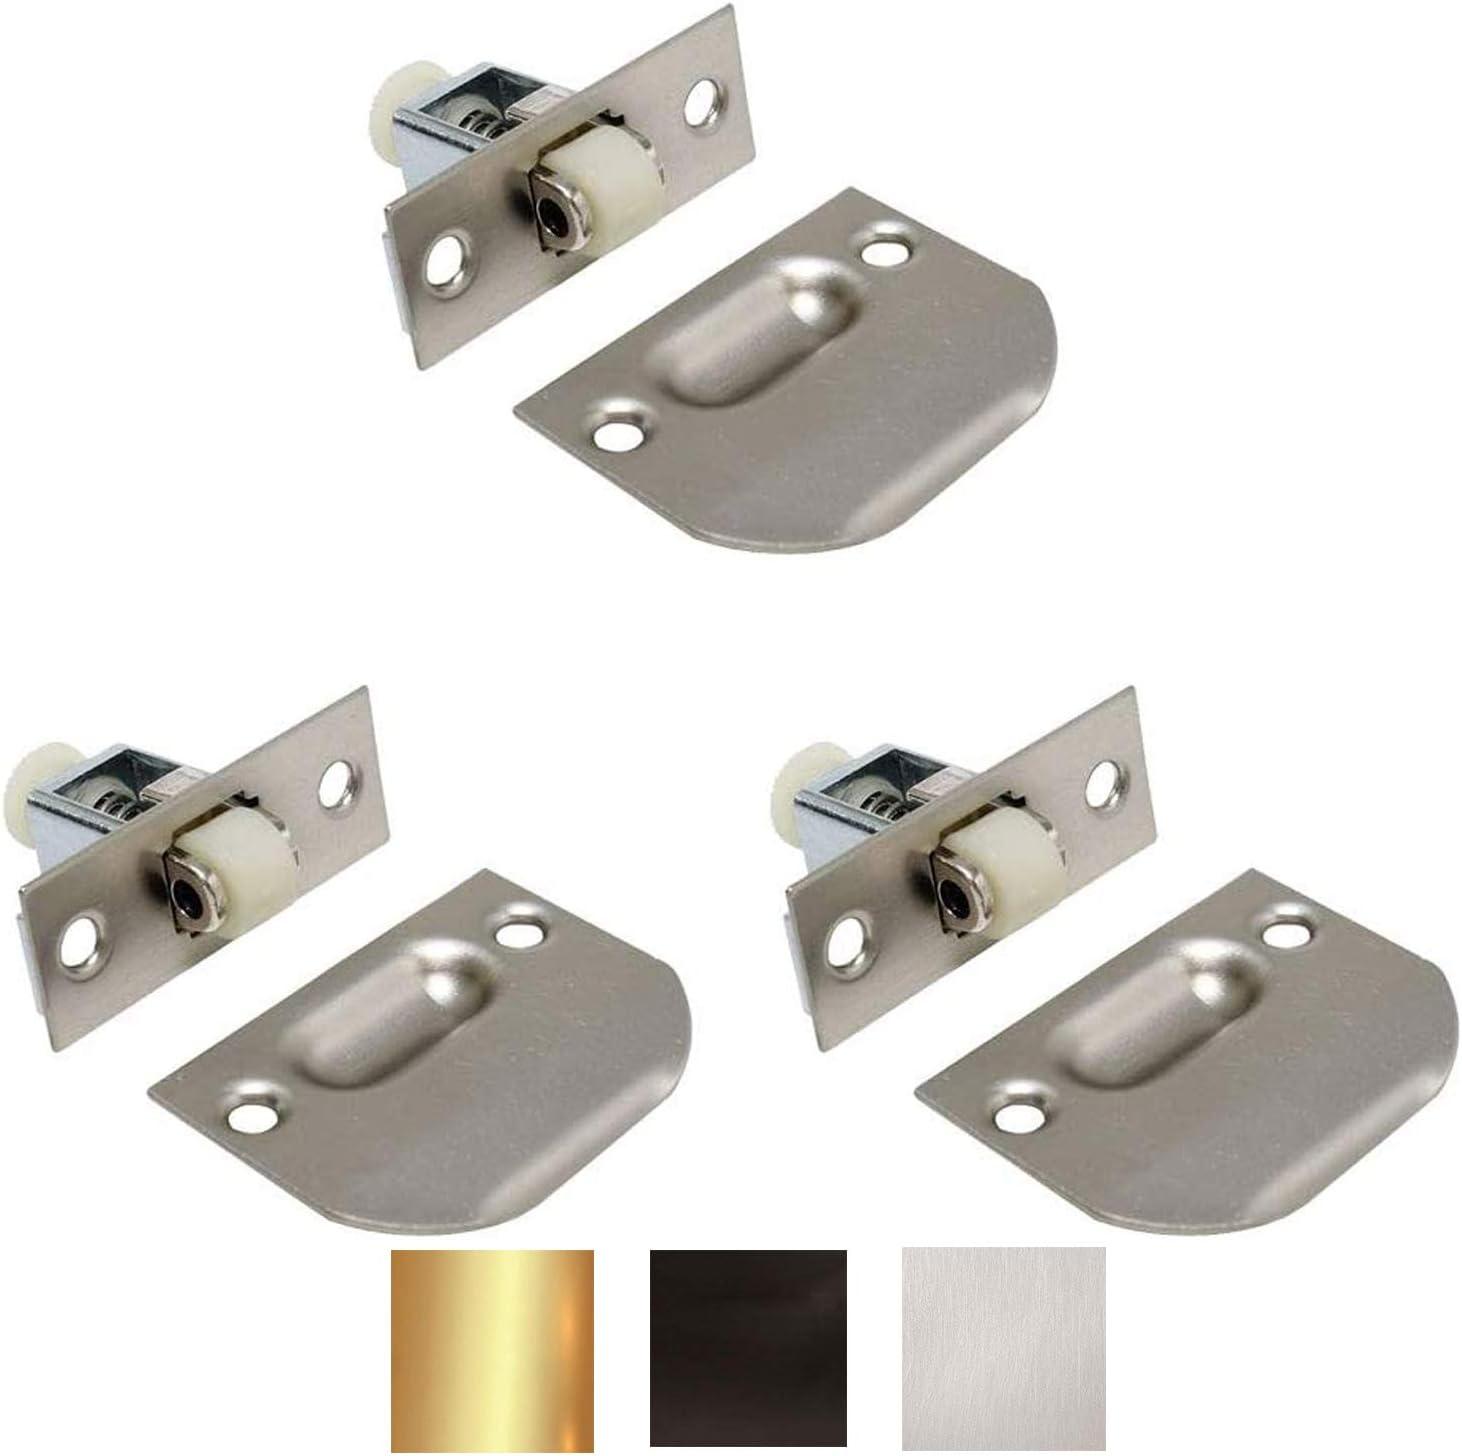 Litepak Adjustable Roller Catch for Furniture Closet Door Cabinet w/Strike Plate & Screws (3 Pack, Satin Nickel)